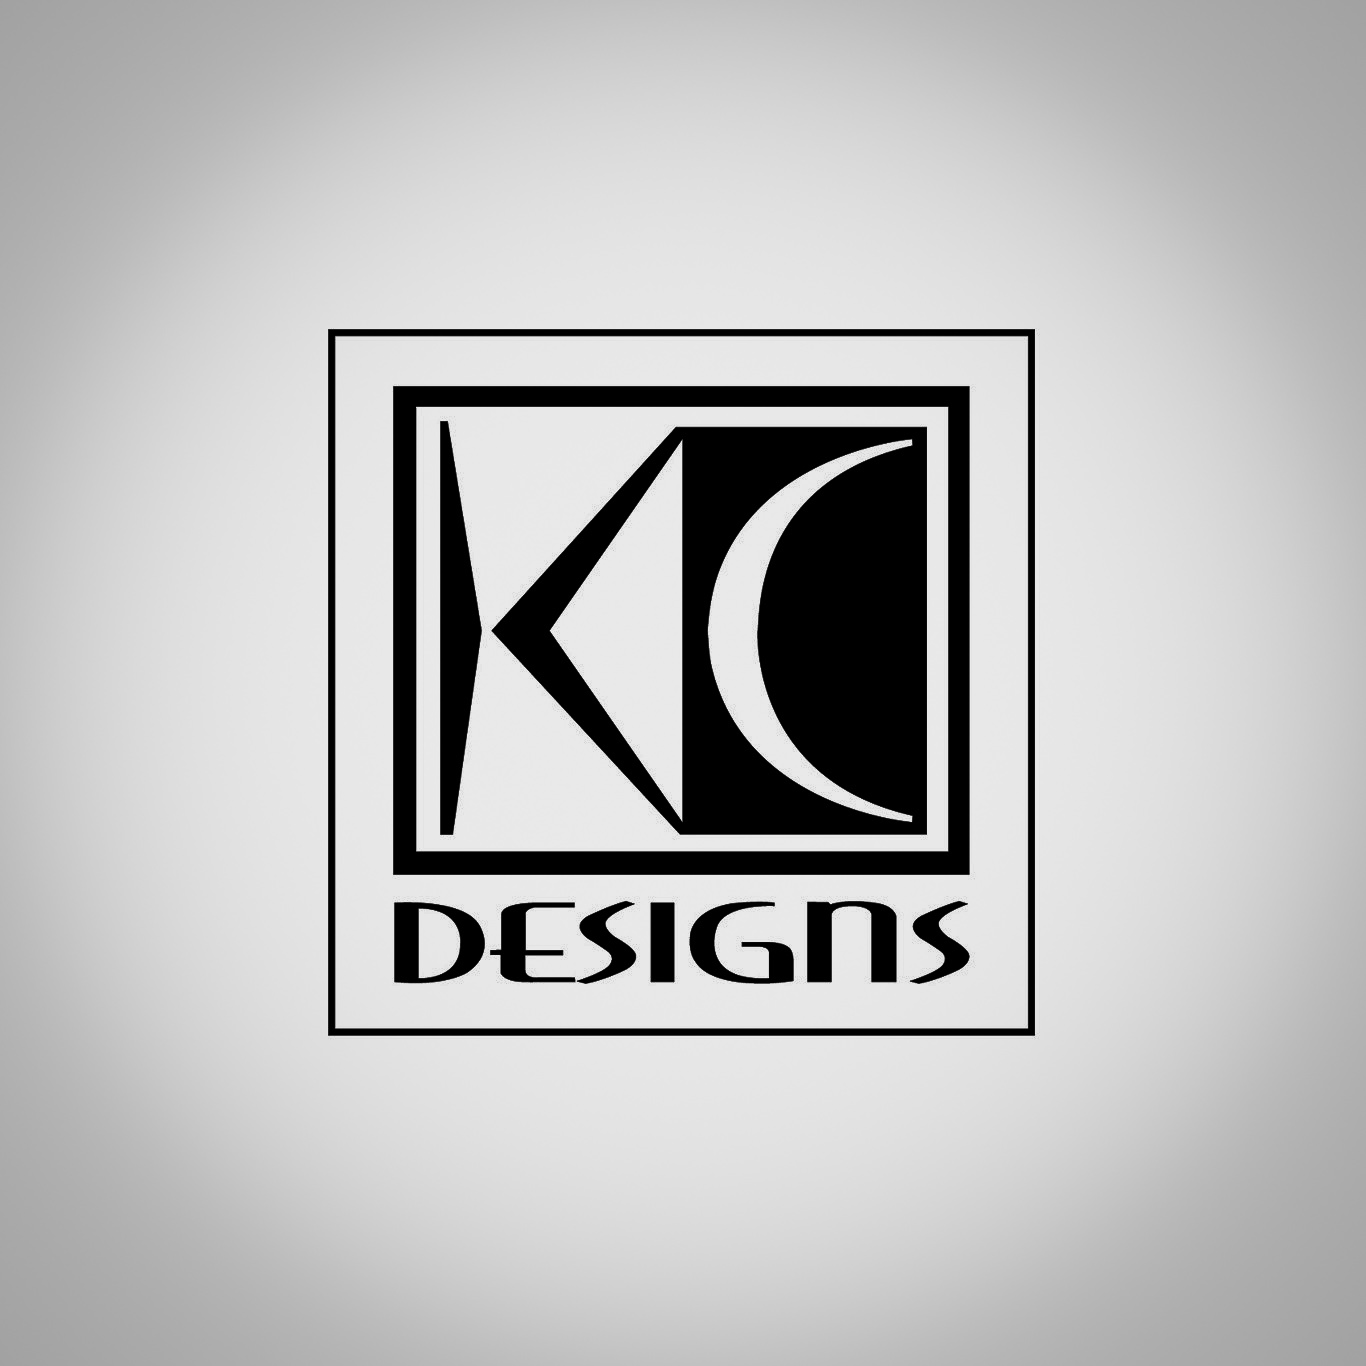 KCdesigns-2.jpg